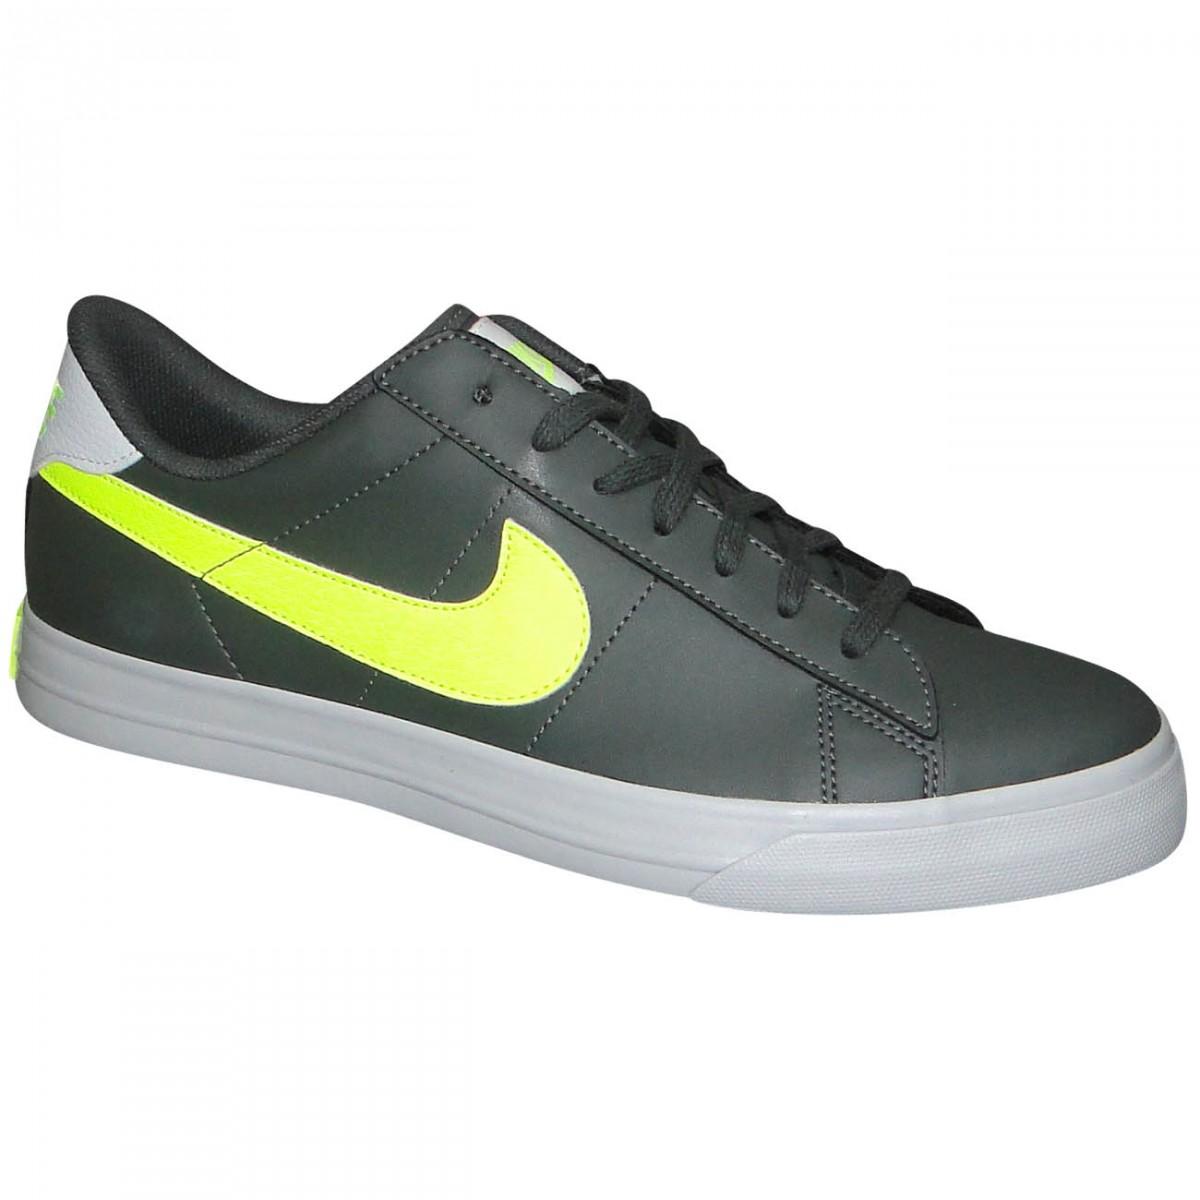 9fd34b4da18 Tenis Nike Sweet Classic Low Sl 580442 013 - Chumbo Limão - Chuteira ...